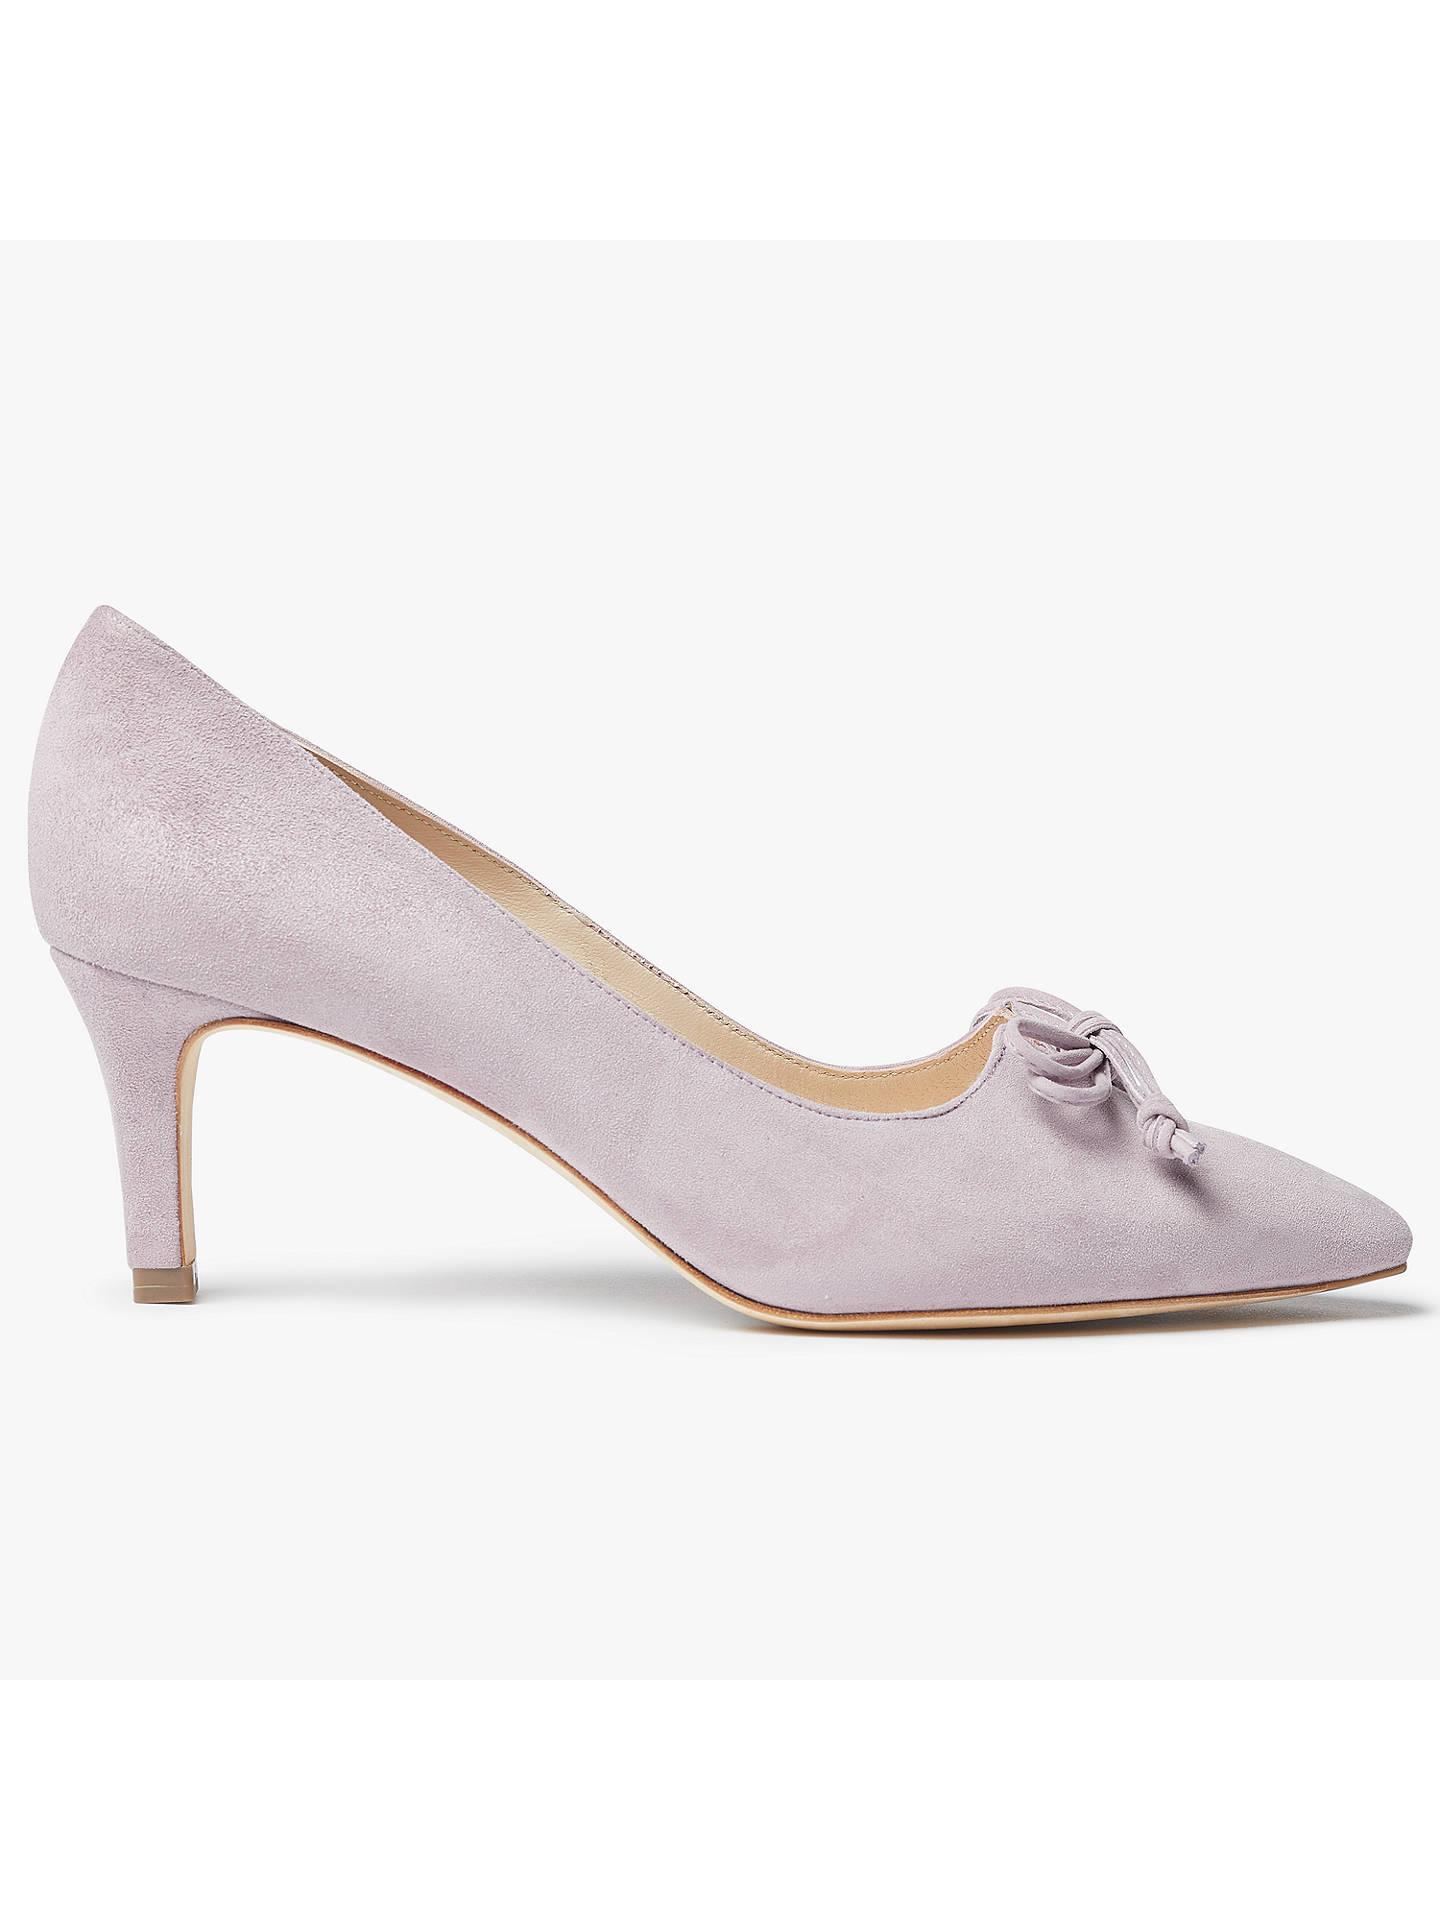 Jigsaw Gail Suede Court Shoe Womens New Pink Dusky Pink